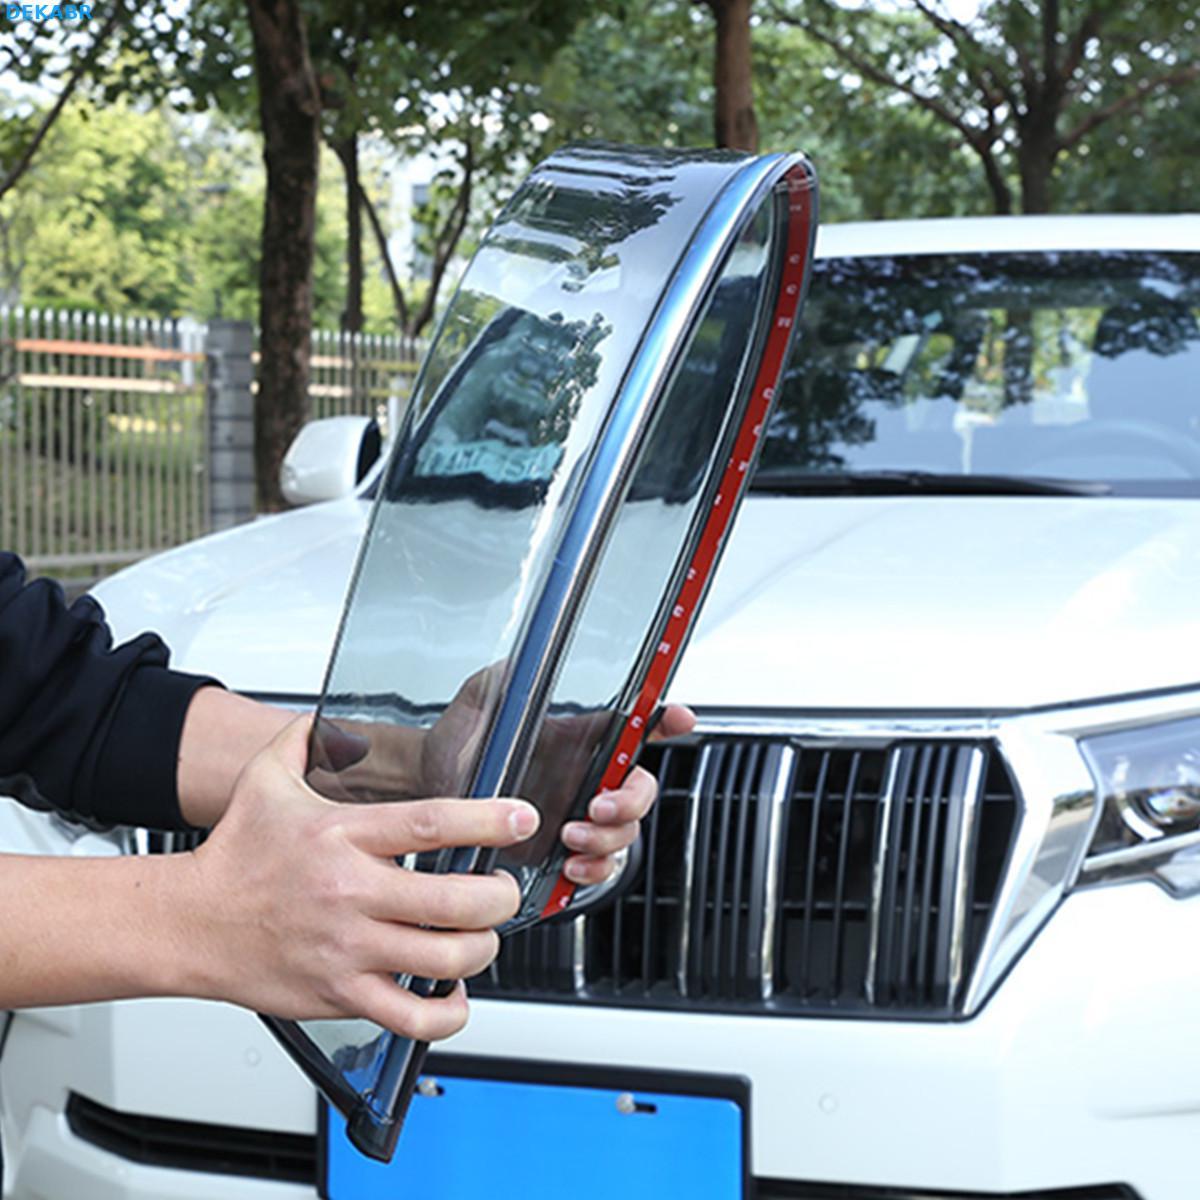 4 stks/set Auto Windows Vizier voor Toyota Prado 150 Regen onderdak in regenachtige dagen 2010 2011 2012 2013 2014 2015 2016 2017 2018 2019